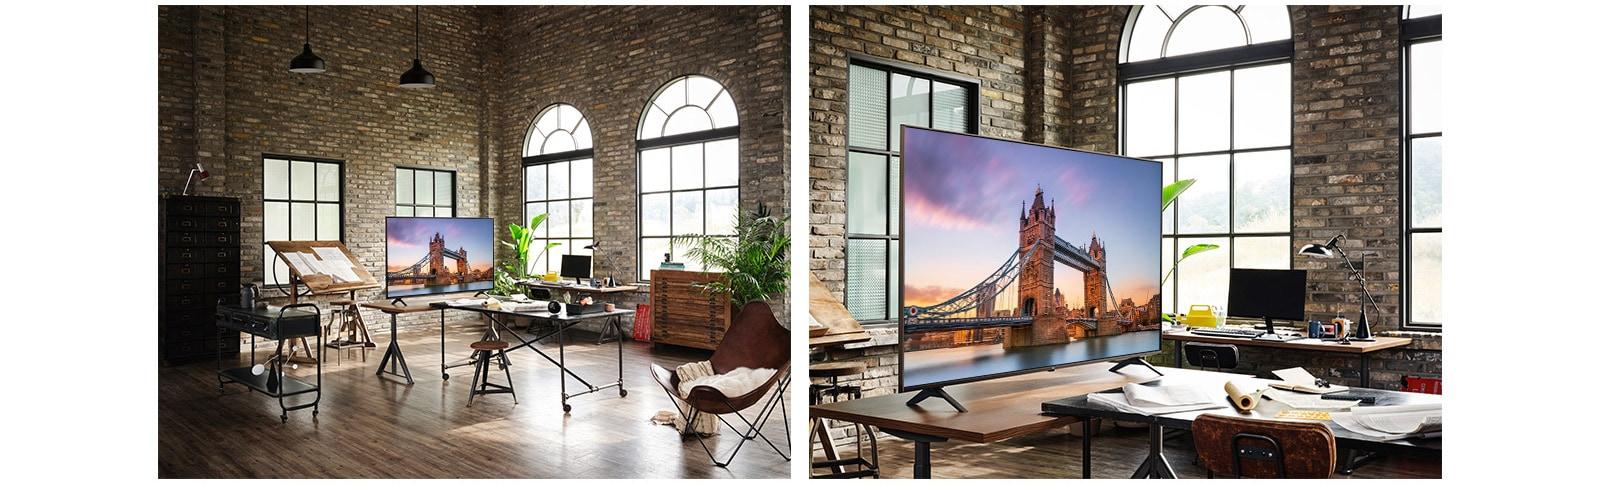 TV-UHD-UP81-06-Design-Desktop-1